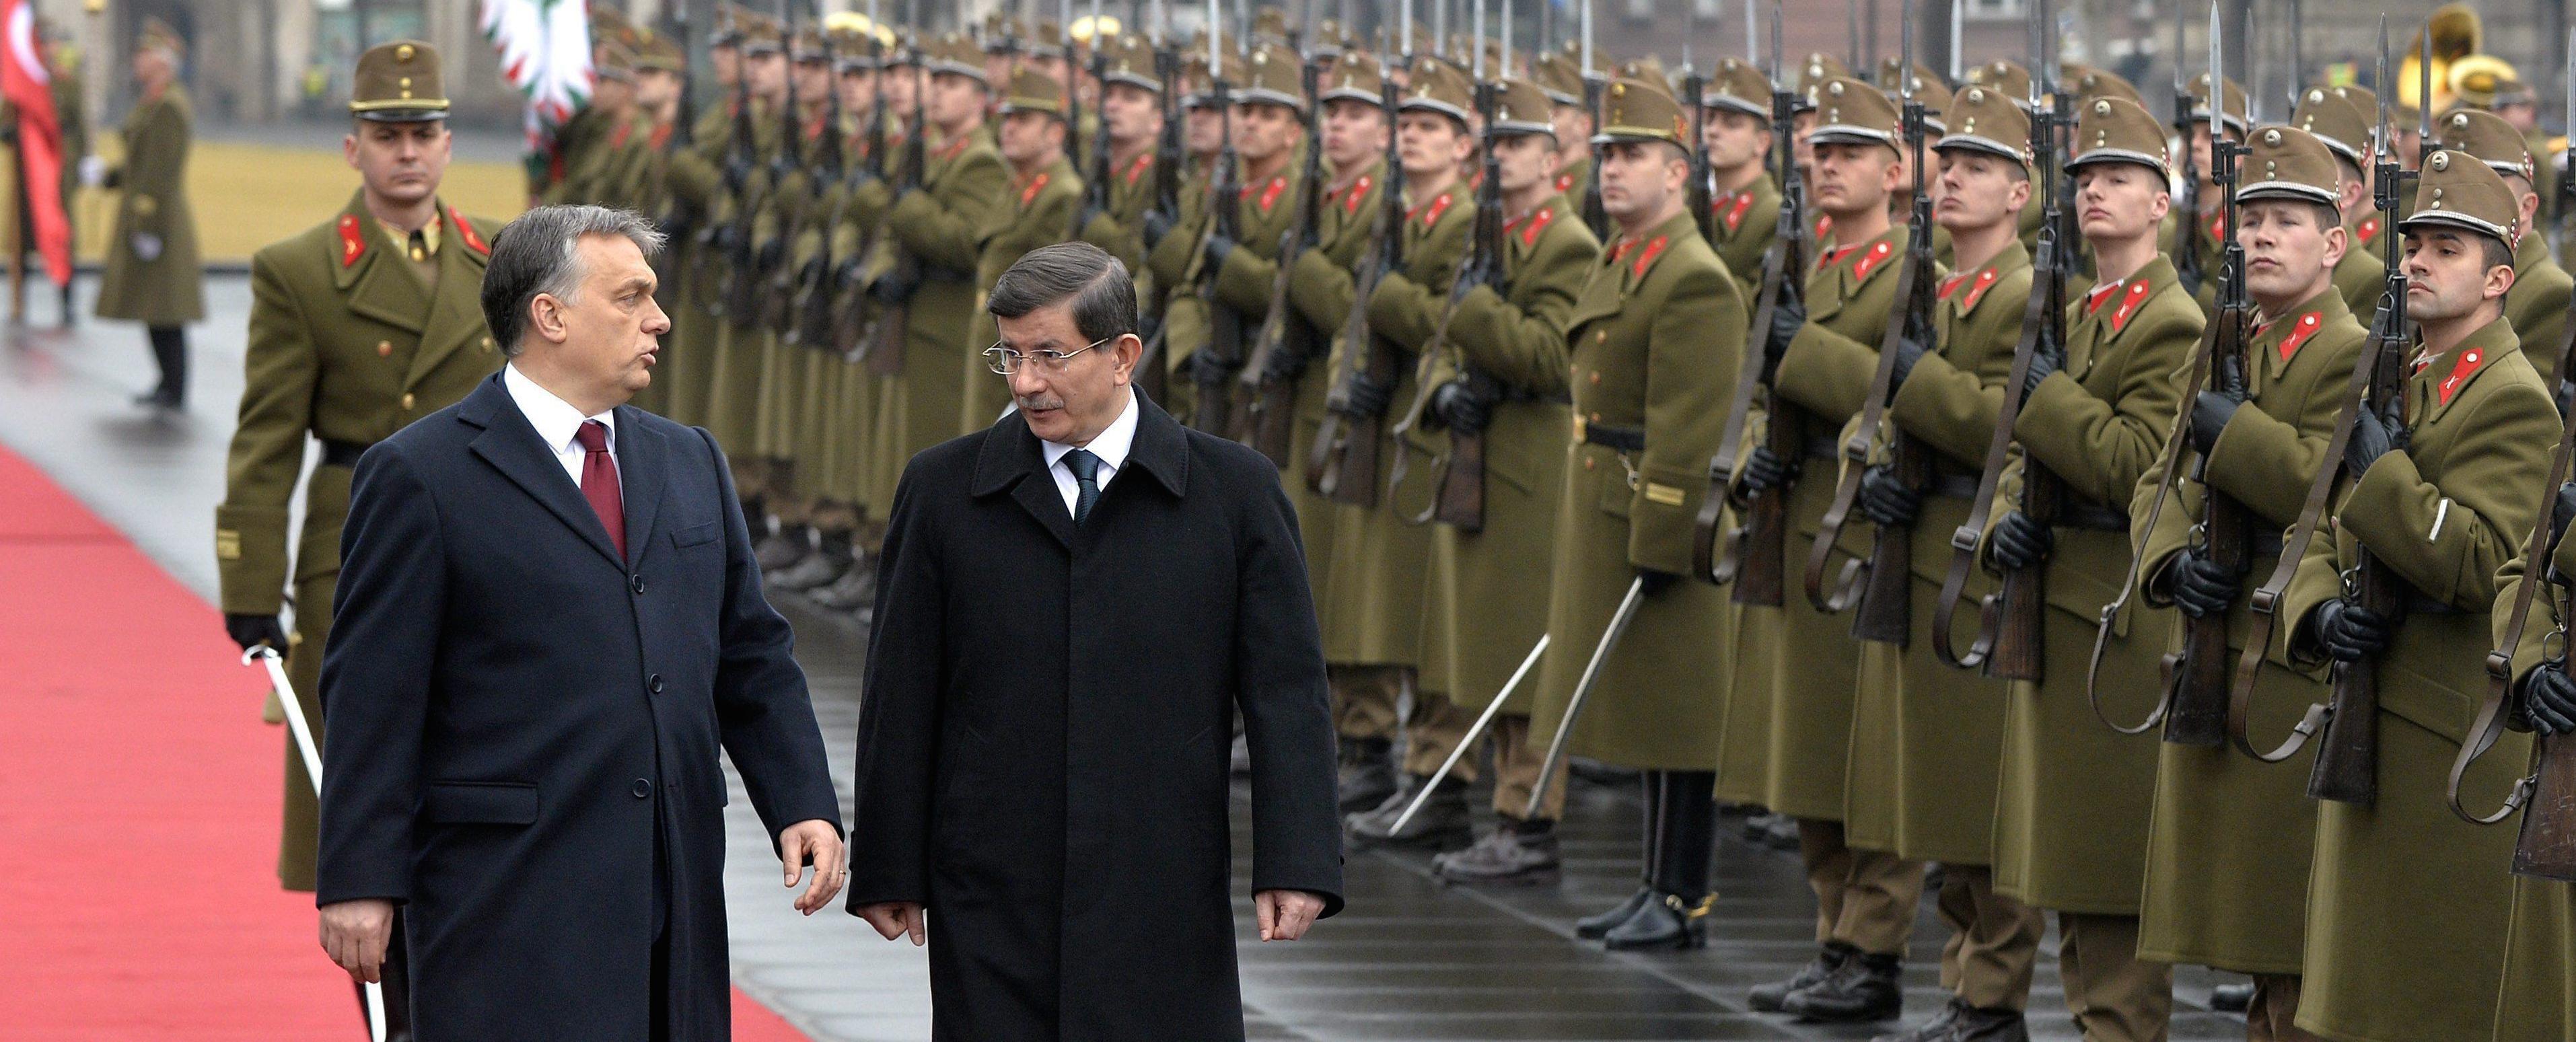 Il premier ungherese Viktor Orbàn